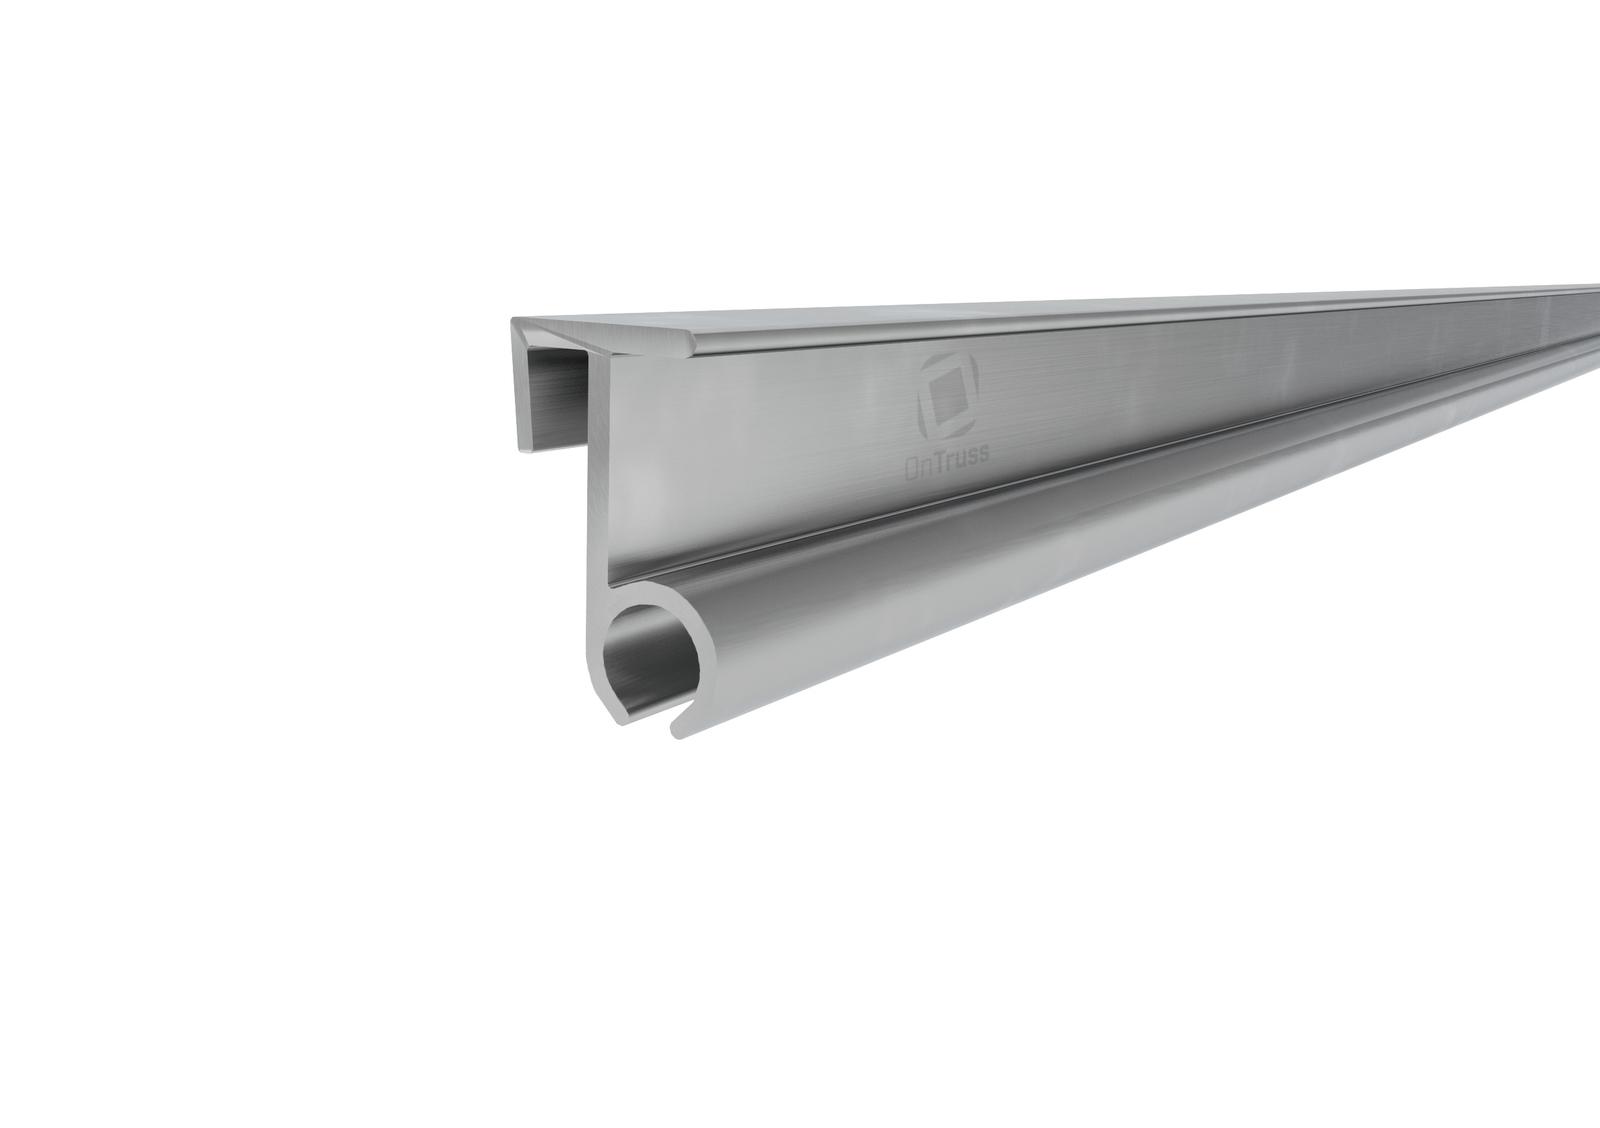 OnTruss Arriba BackCover Profile 3m sil 2x